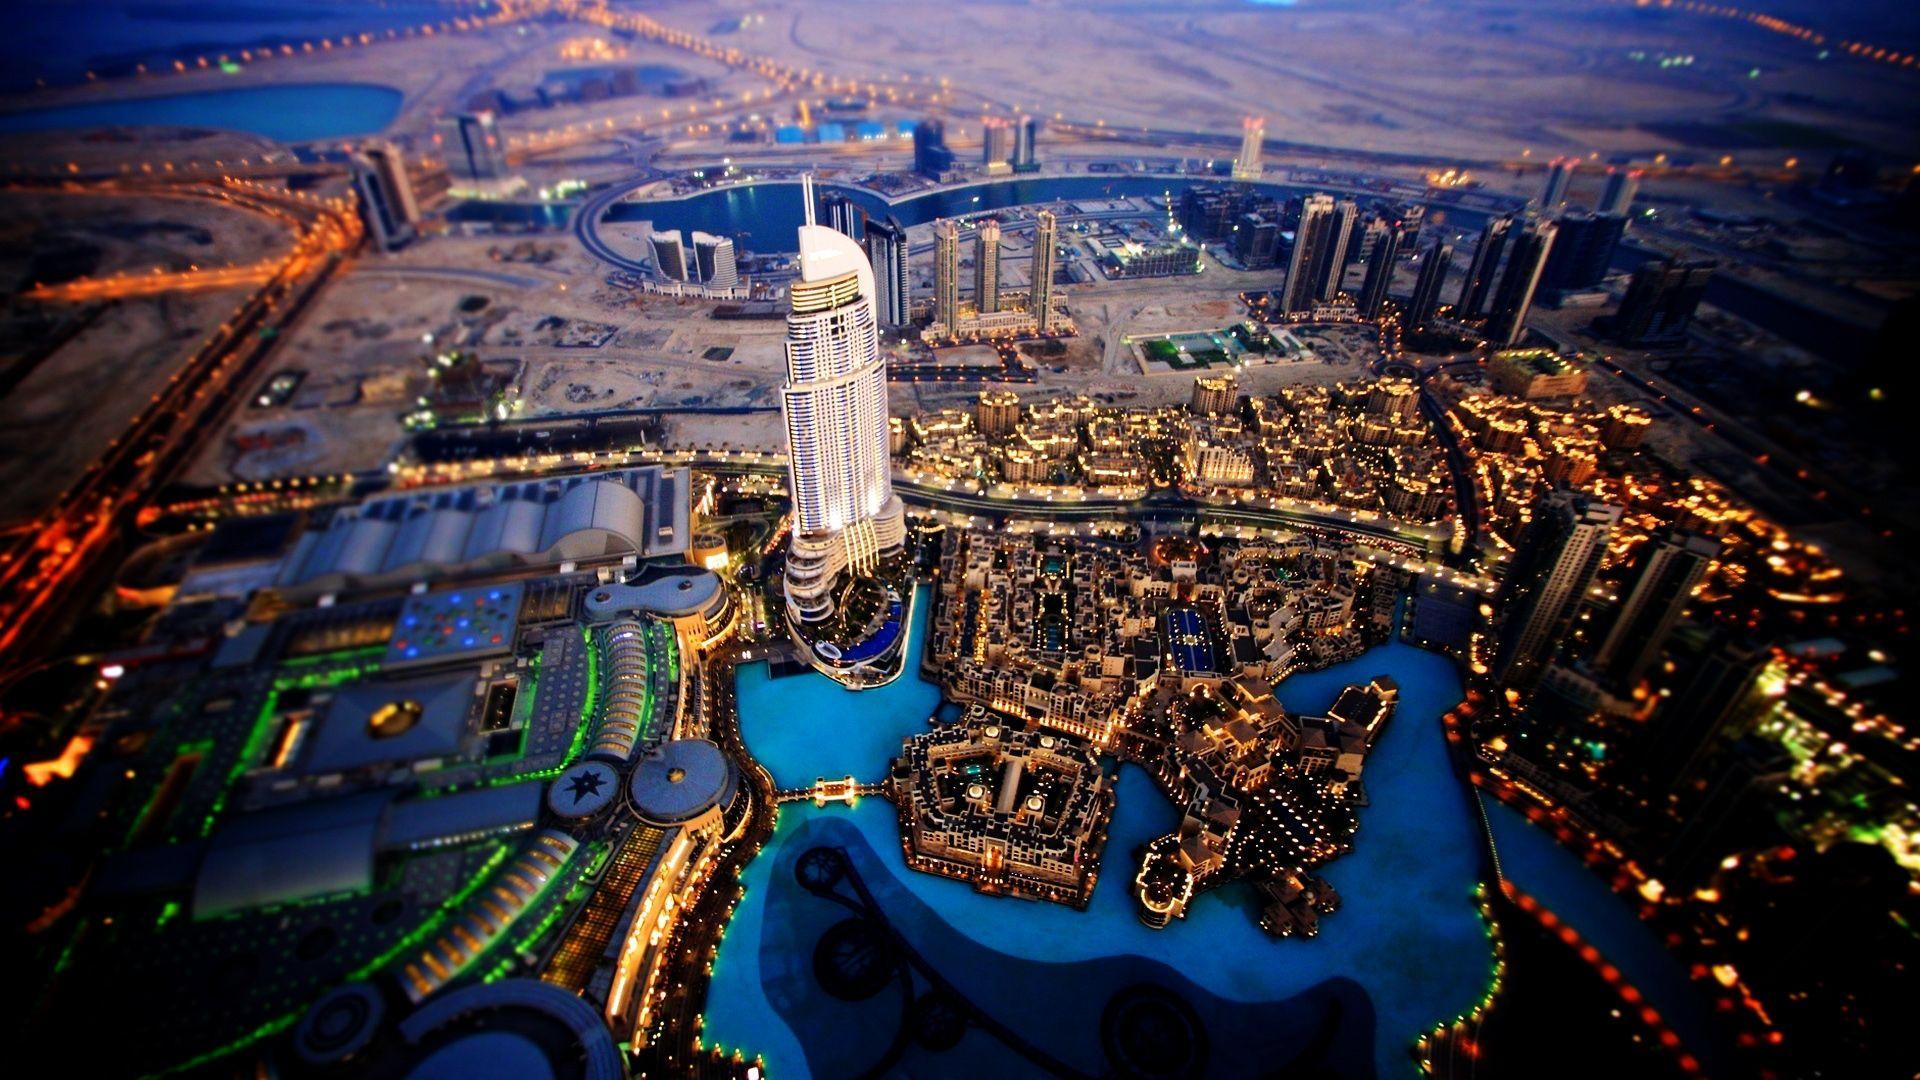 dubai city from the sky 168088 | AERIAL VIEWS | Pinterest